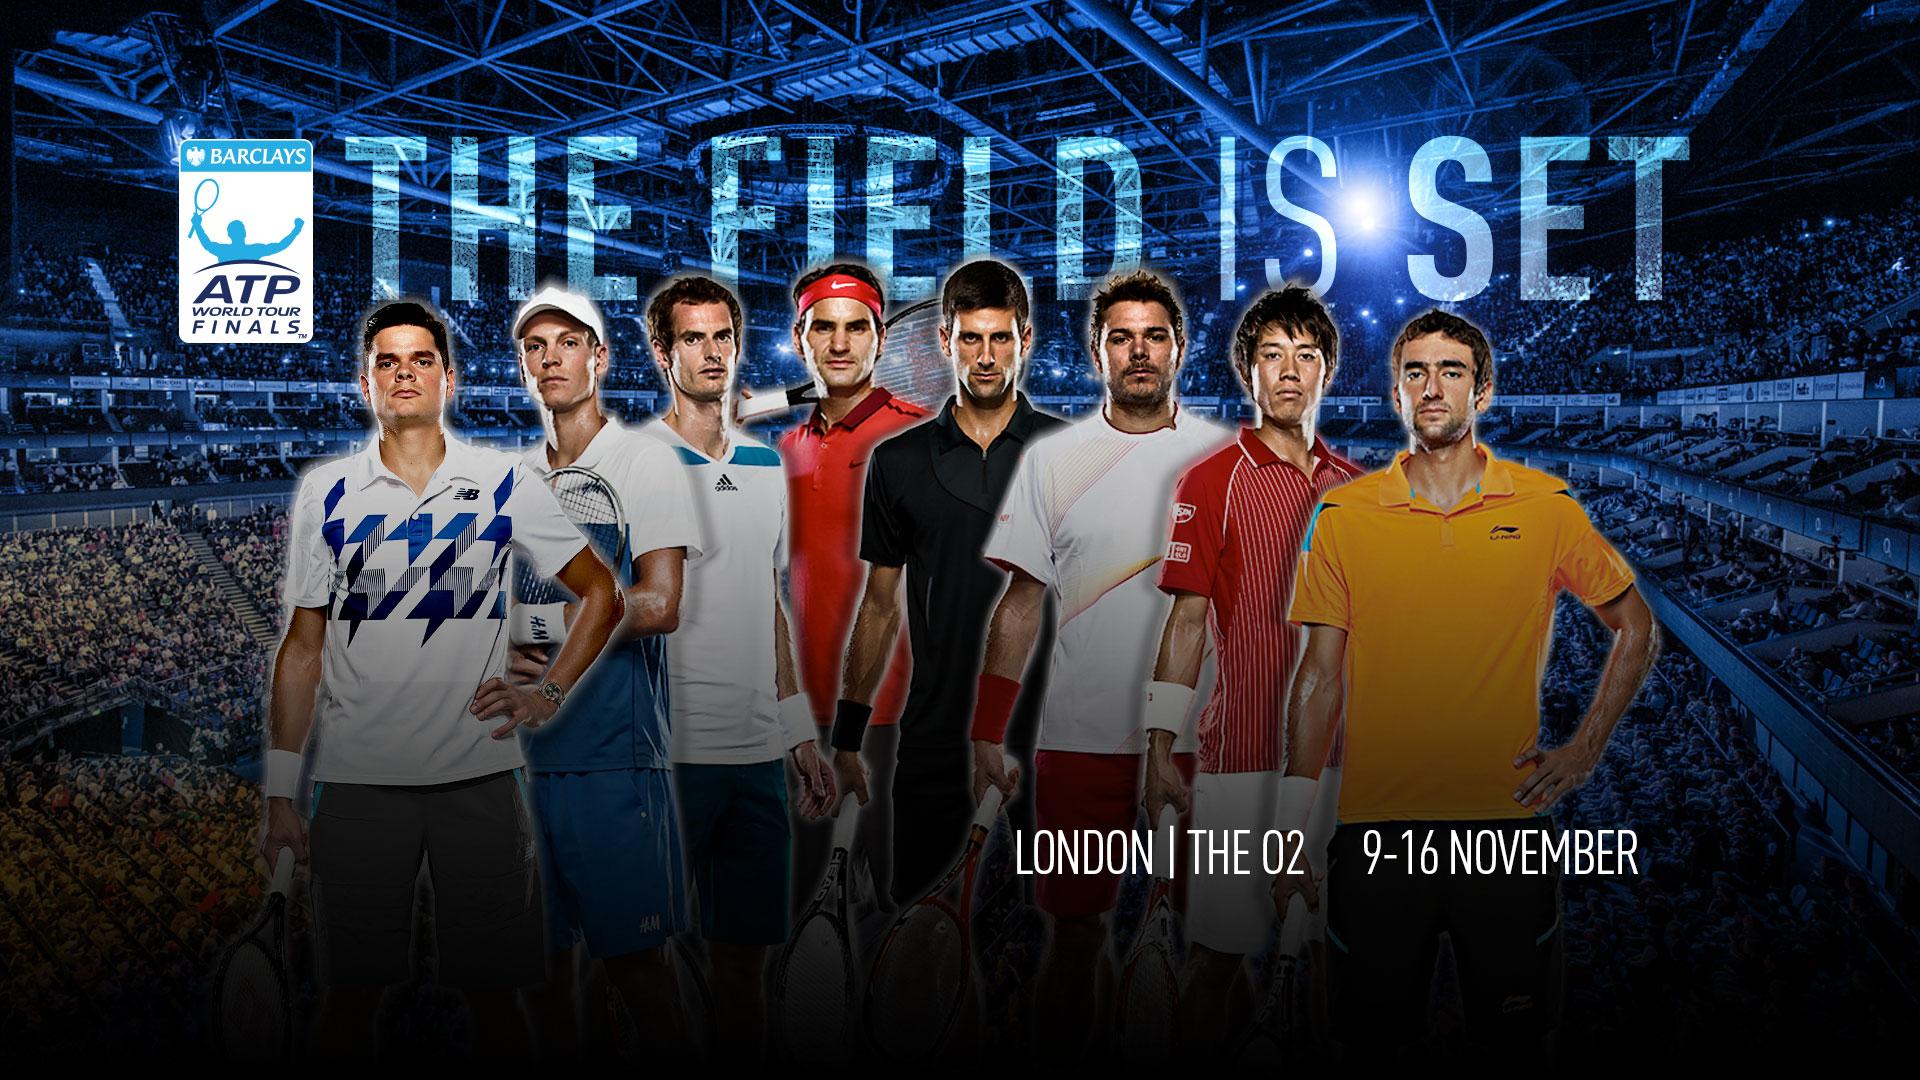 ATP WORLD TOUR FINALS 2014 Round Robin DRAWS   La liberte 1920x1080